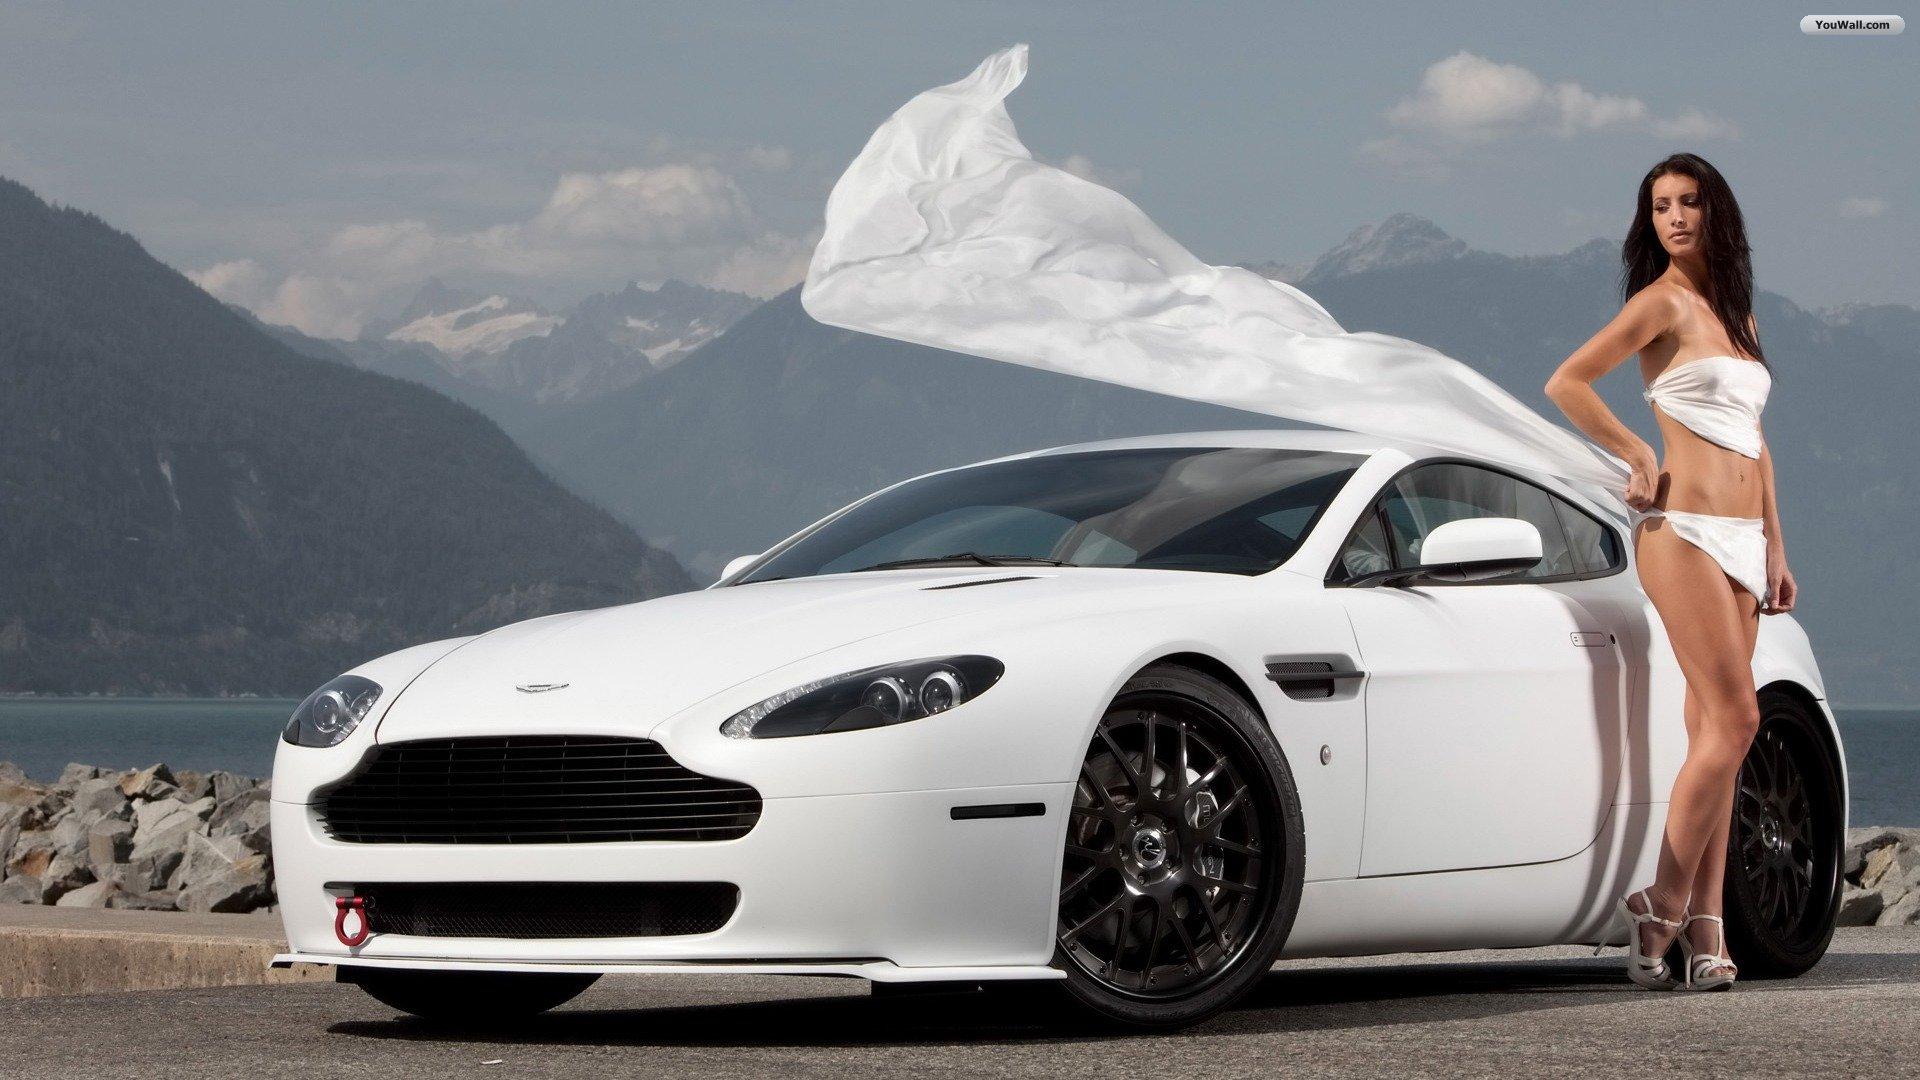 girl and white car wallpaper 3a432jpg 1920x1080